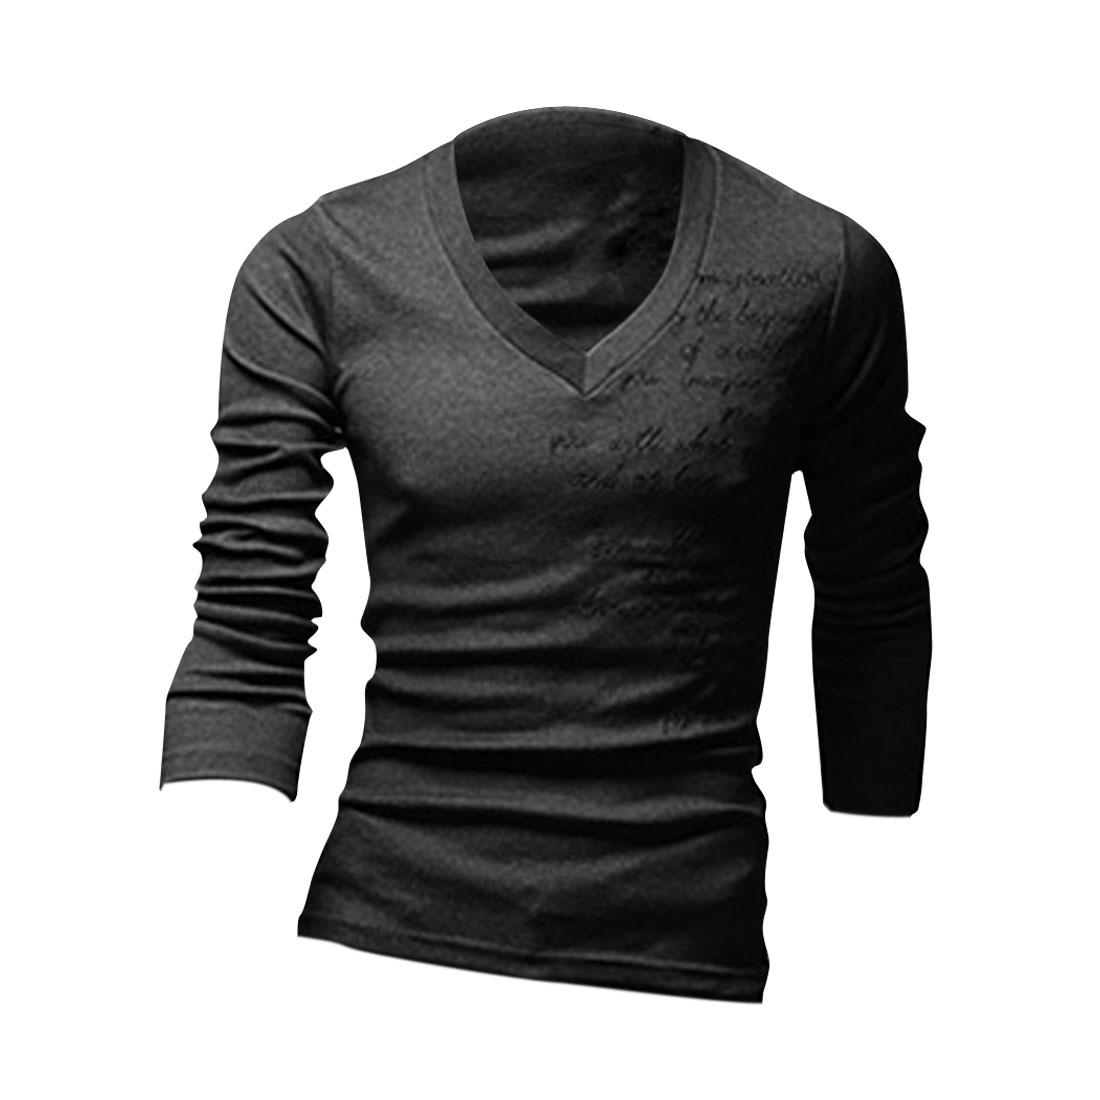 Men Long Sleeve Pullover Embroidery Decor Shirt Dark Gray M